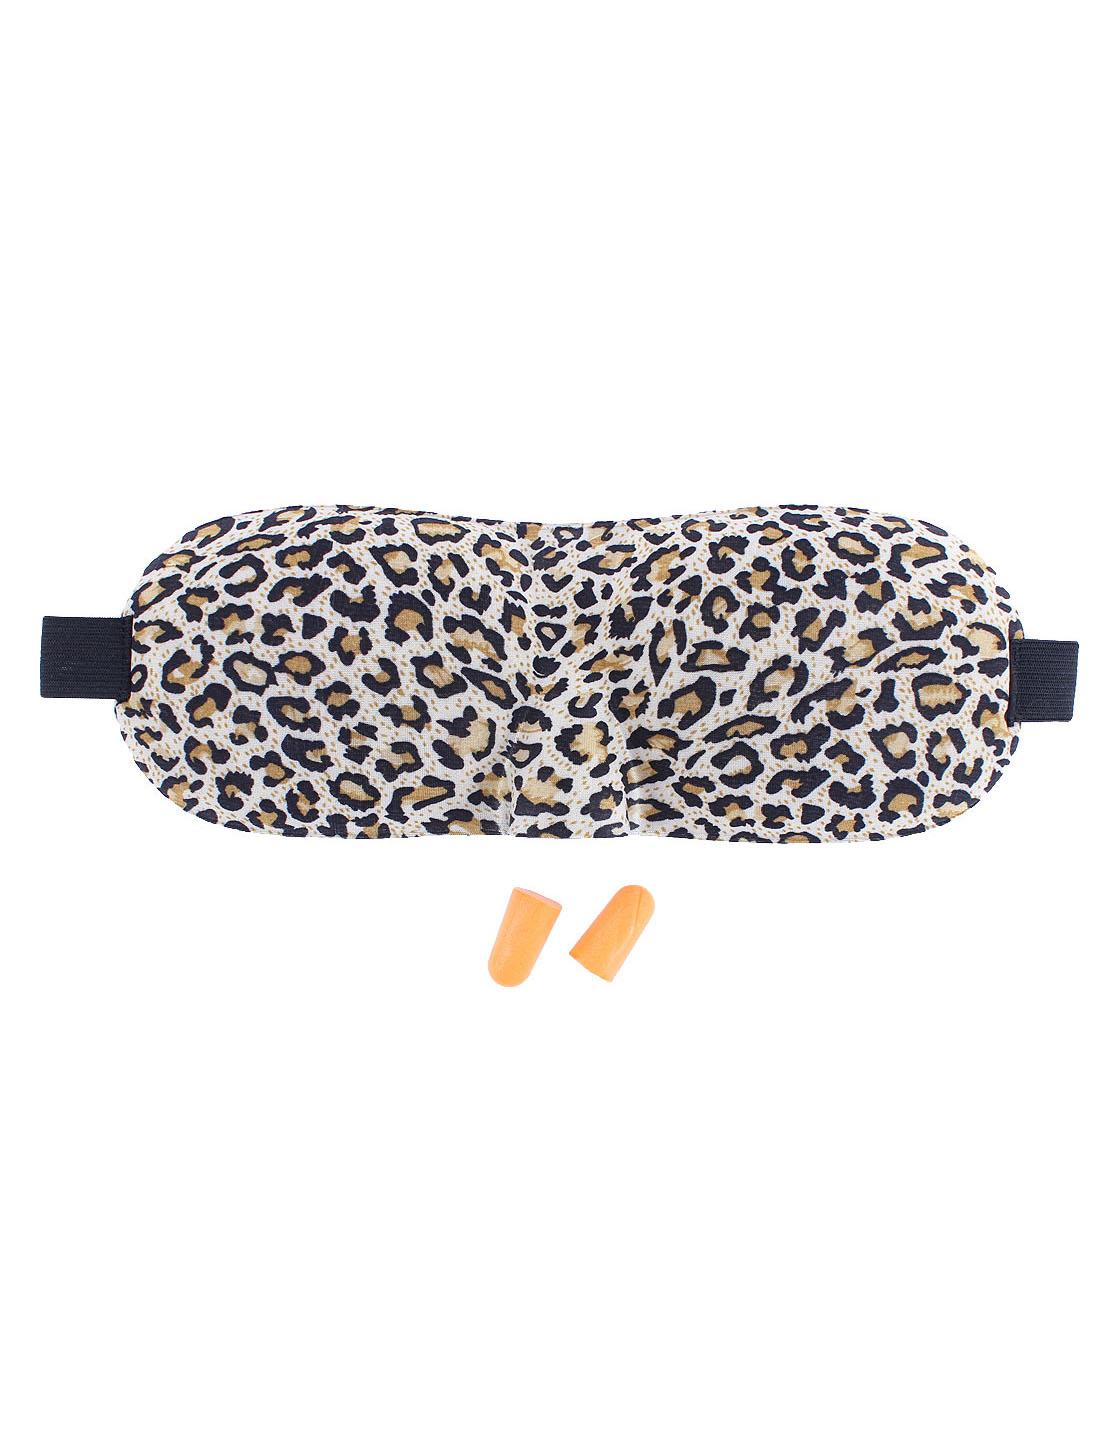 3D Soft Eye Shade Travel Aid Sleeping Mask Sponge Cover Blinder